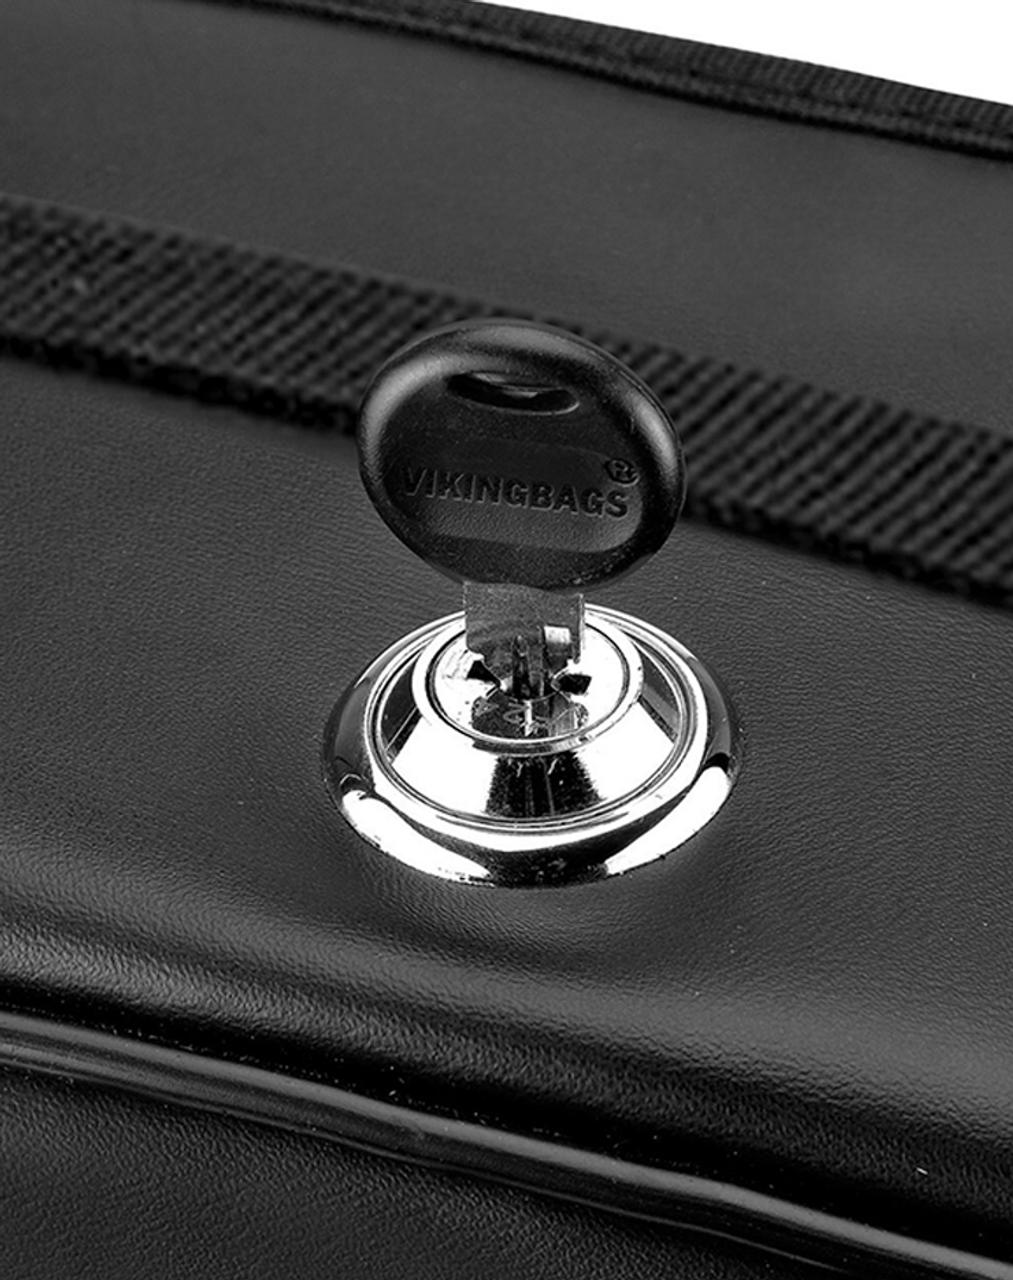 Honda Magna 750 Armor Shock Cutout Motorcycle Saddlebags lock key view